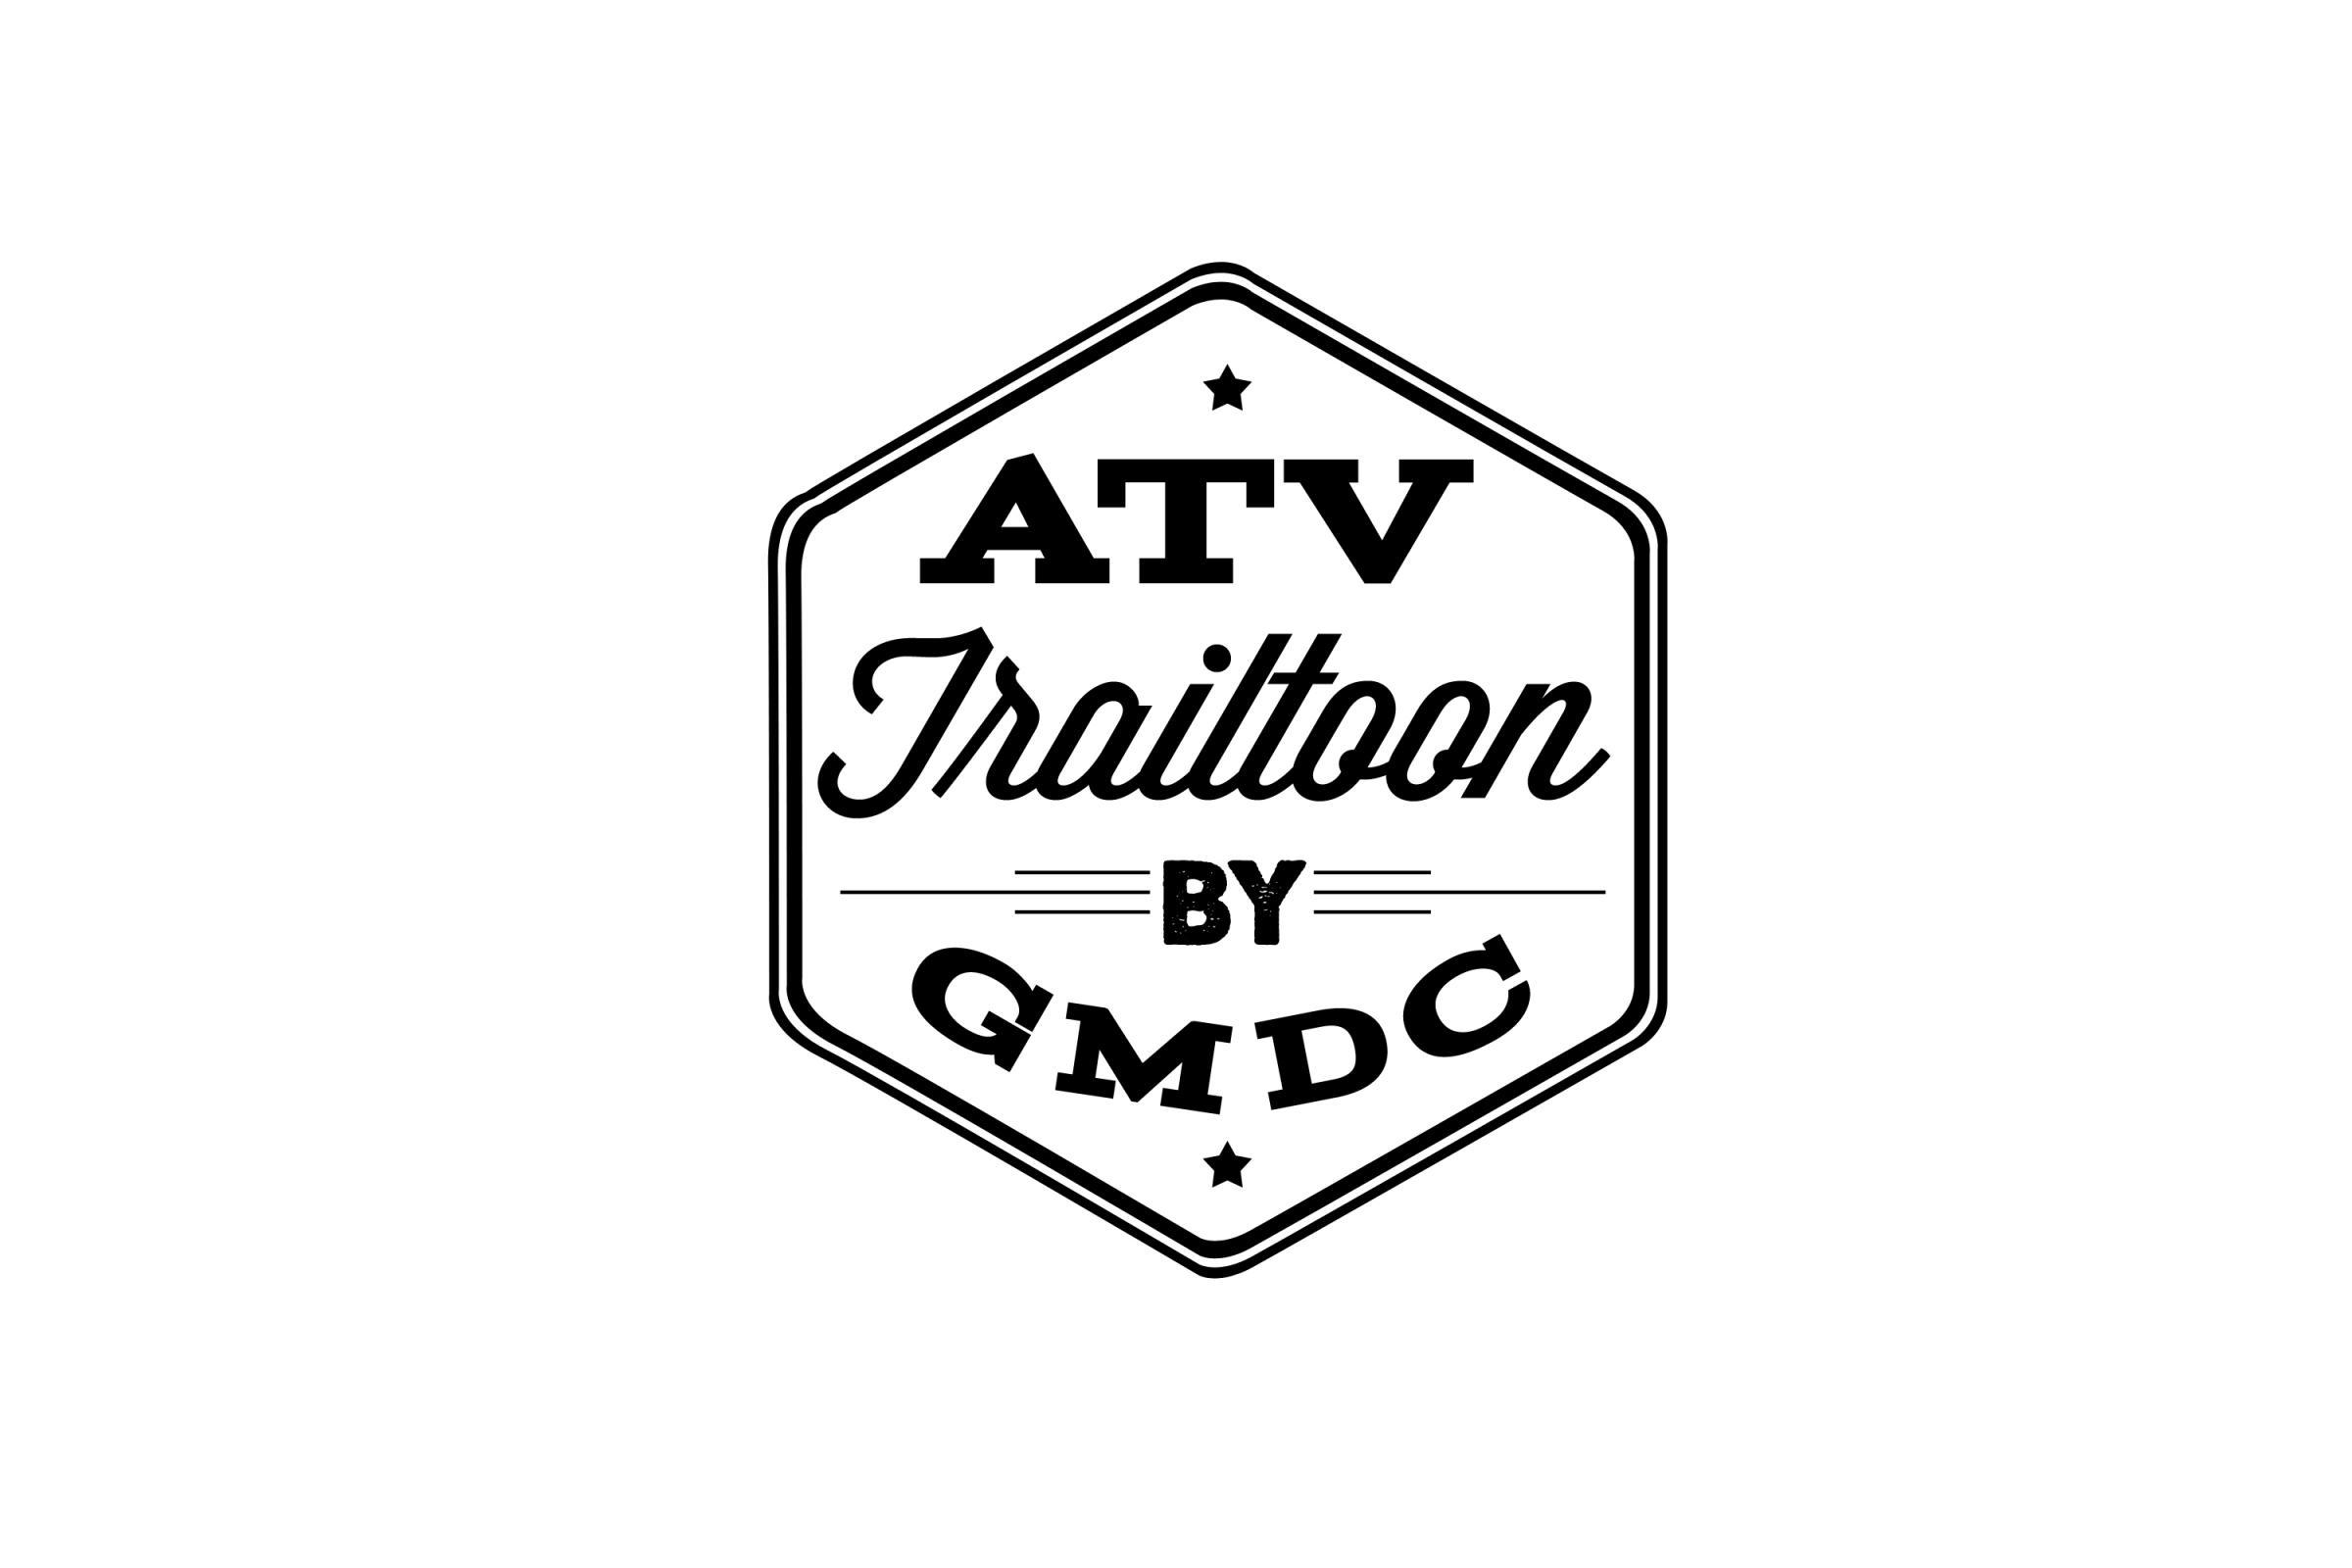 Atv Trailtoon By Gmdc